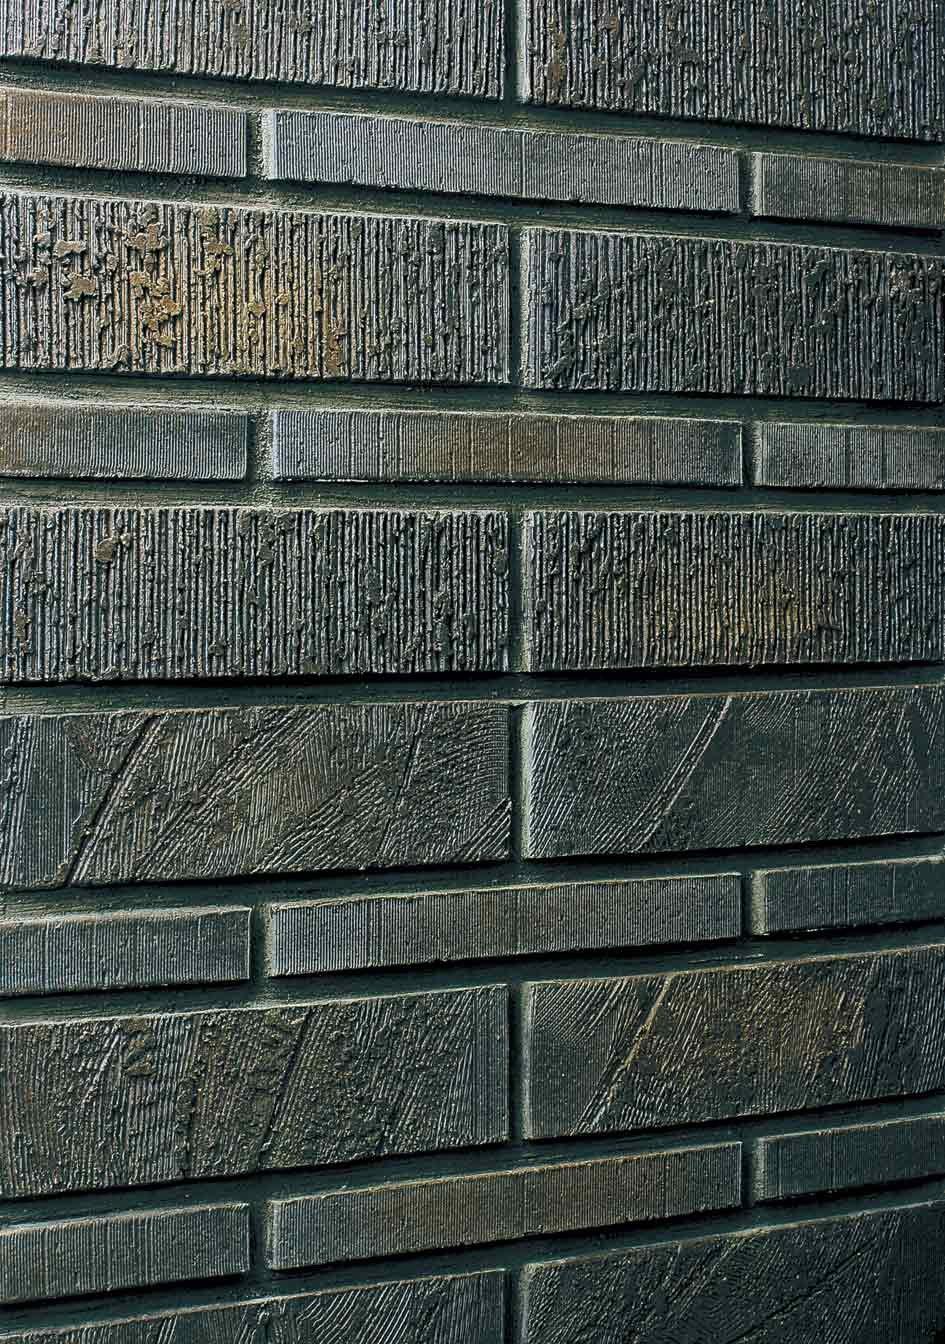 Exterior wall tile azekura for sale buyer japan for Exterior tiles design india